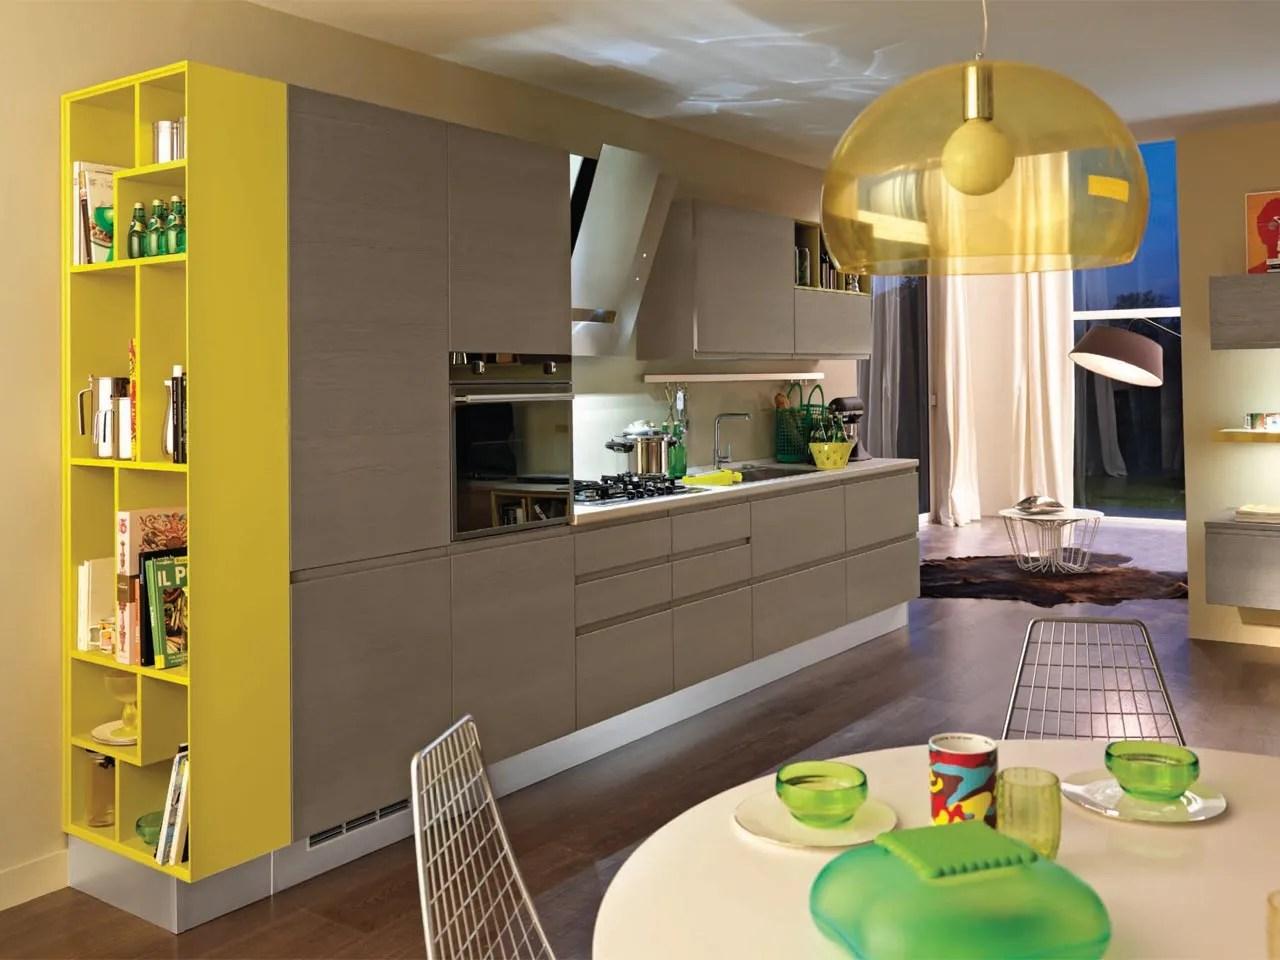 LINDA Cucina by Cucine Lube